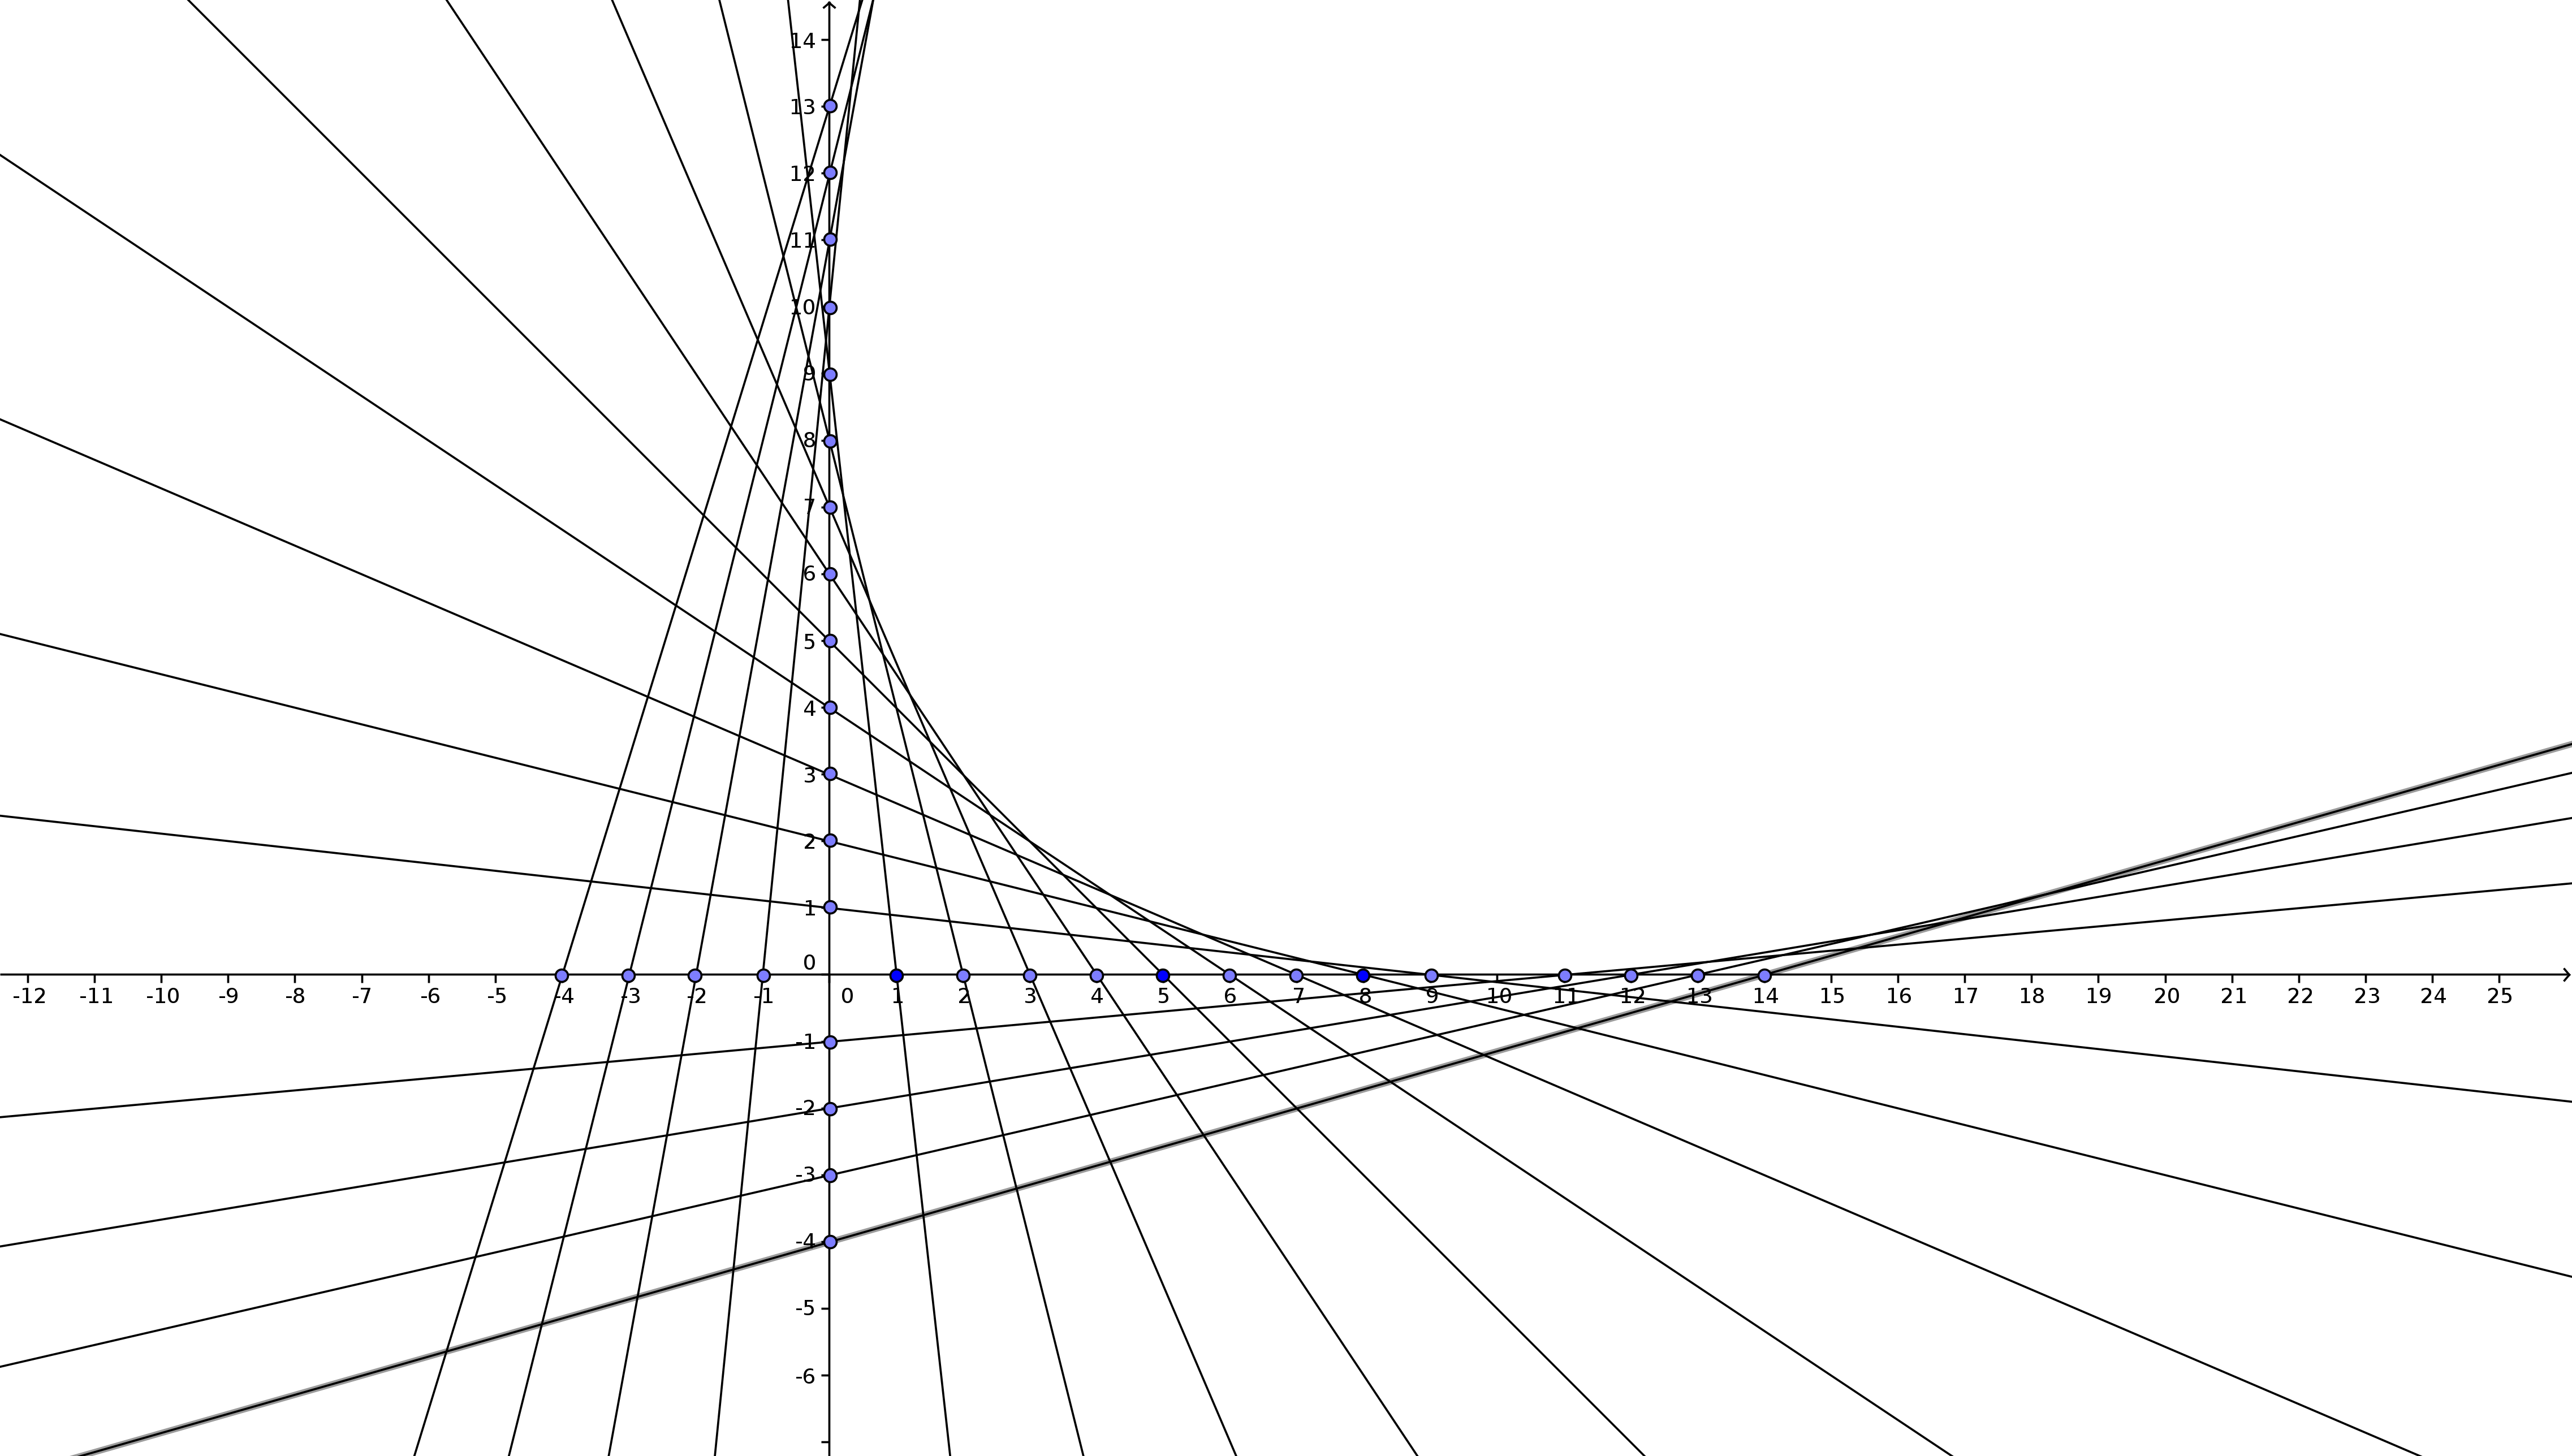 4548x2575 Ernesto Elementary Geometry